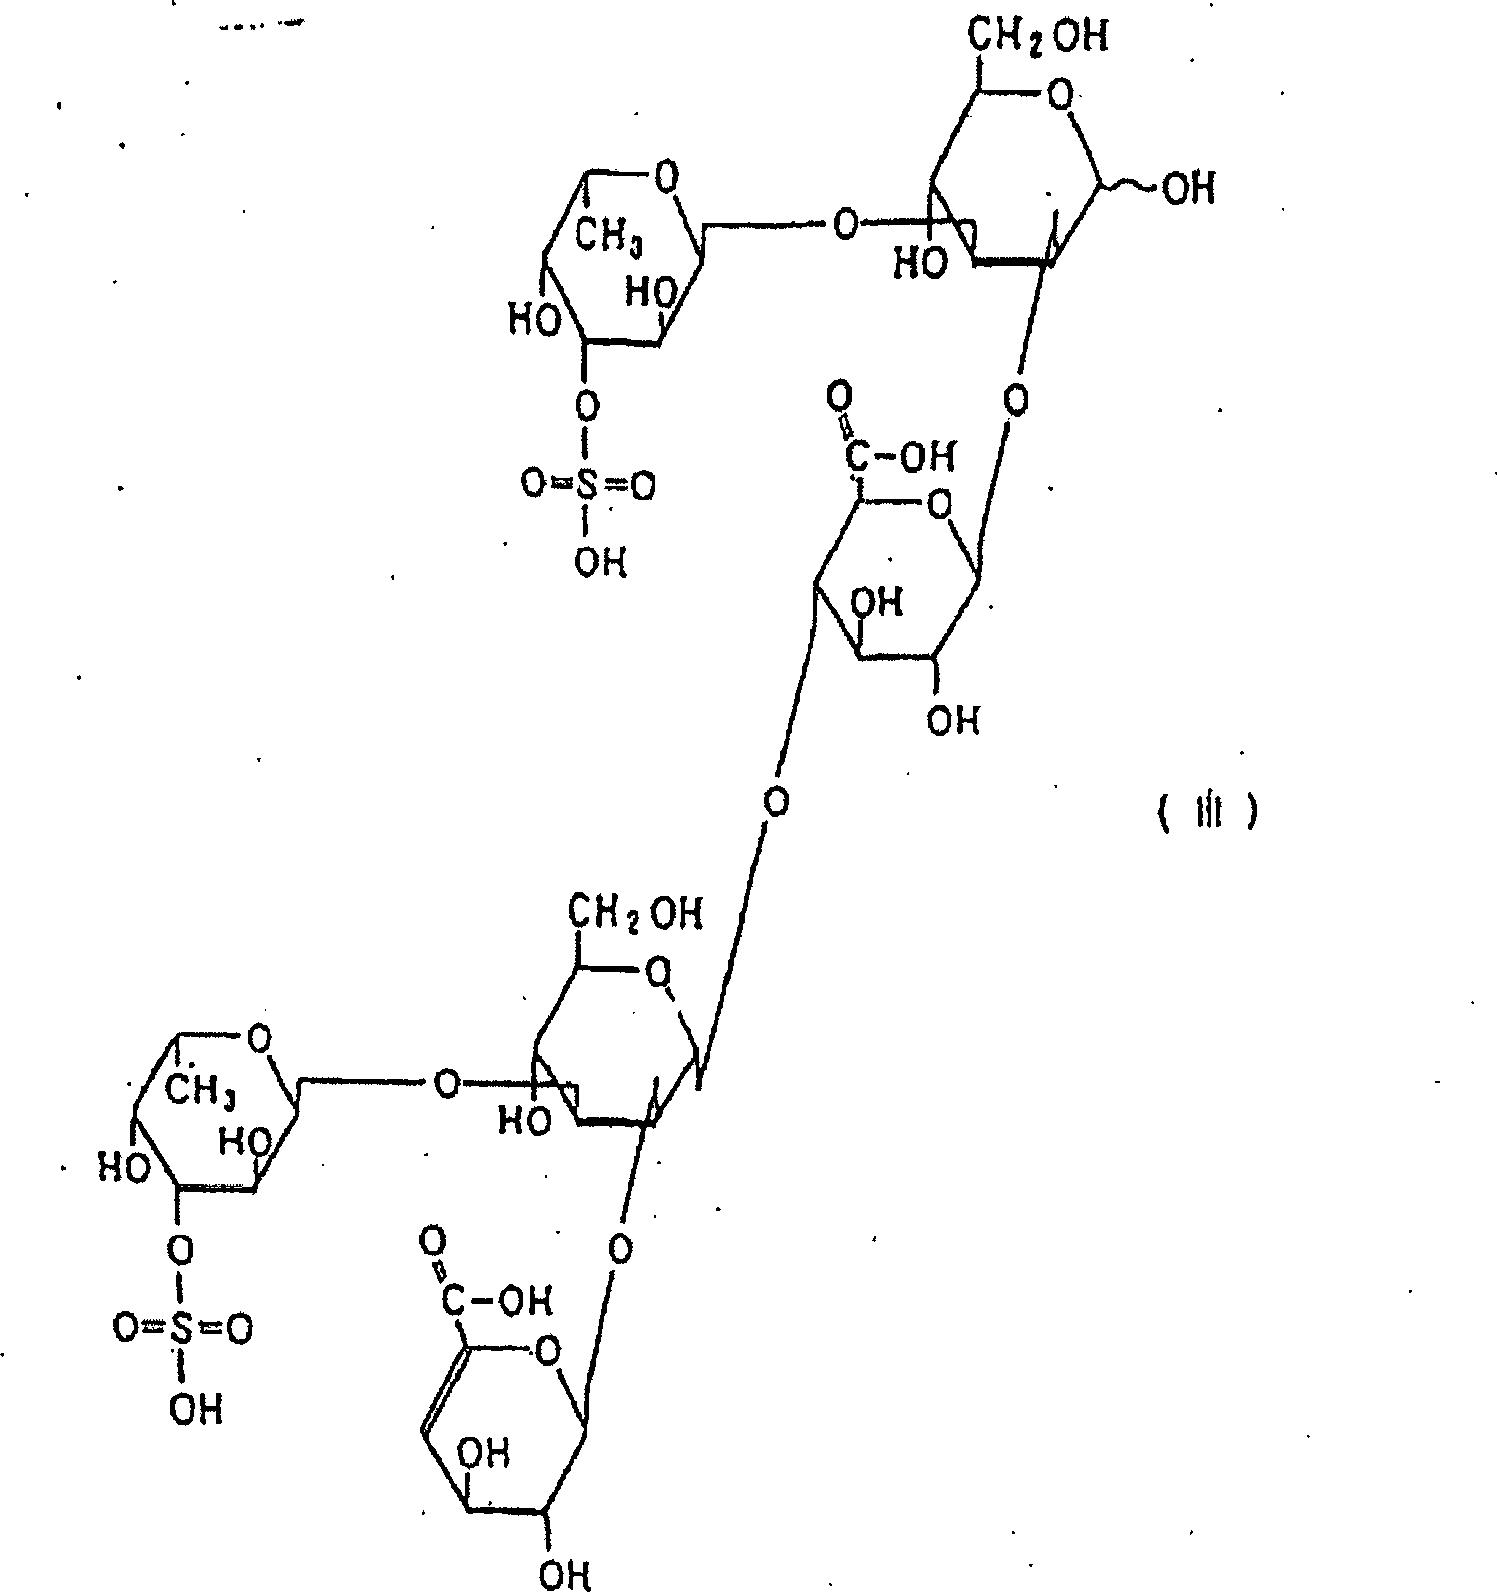 DE69736110T2 - Use of fucoidan - Google Patents